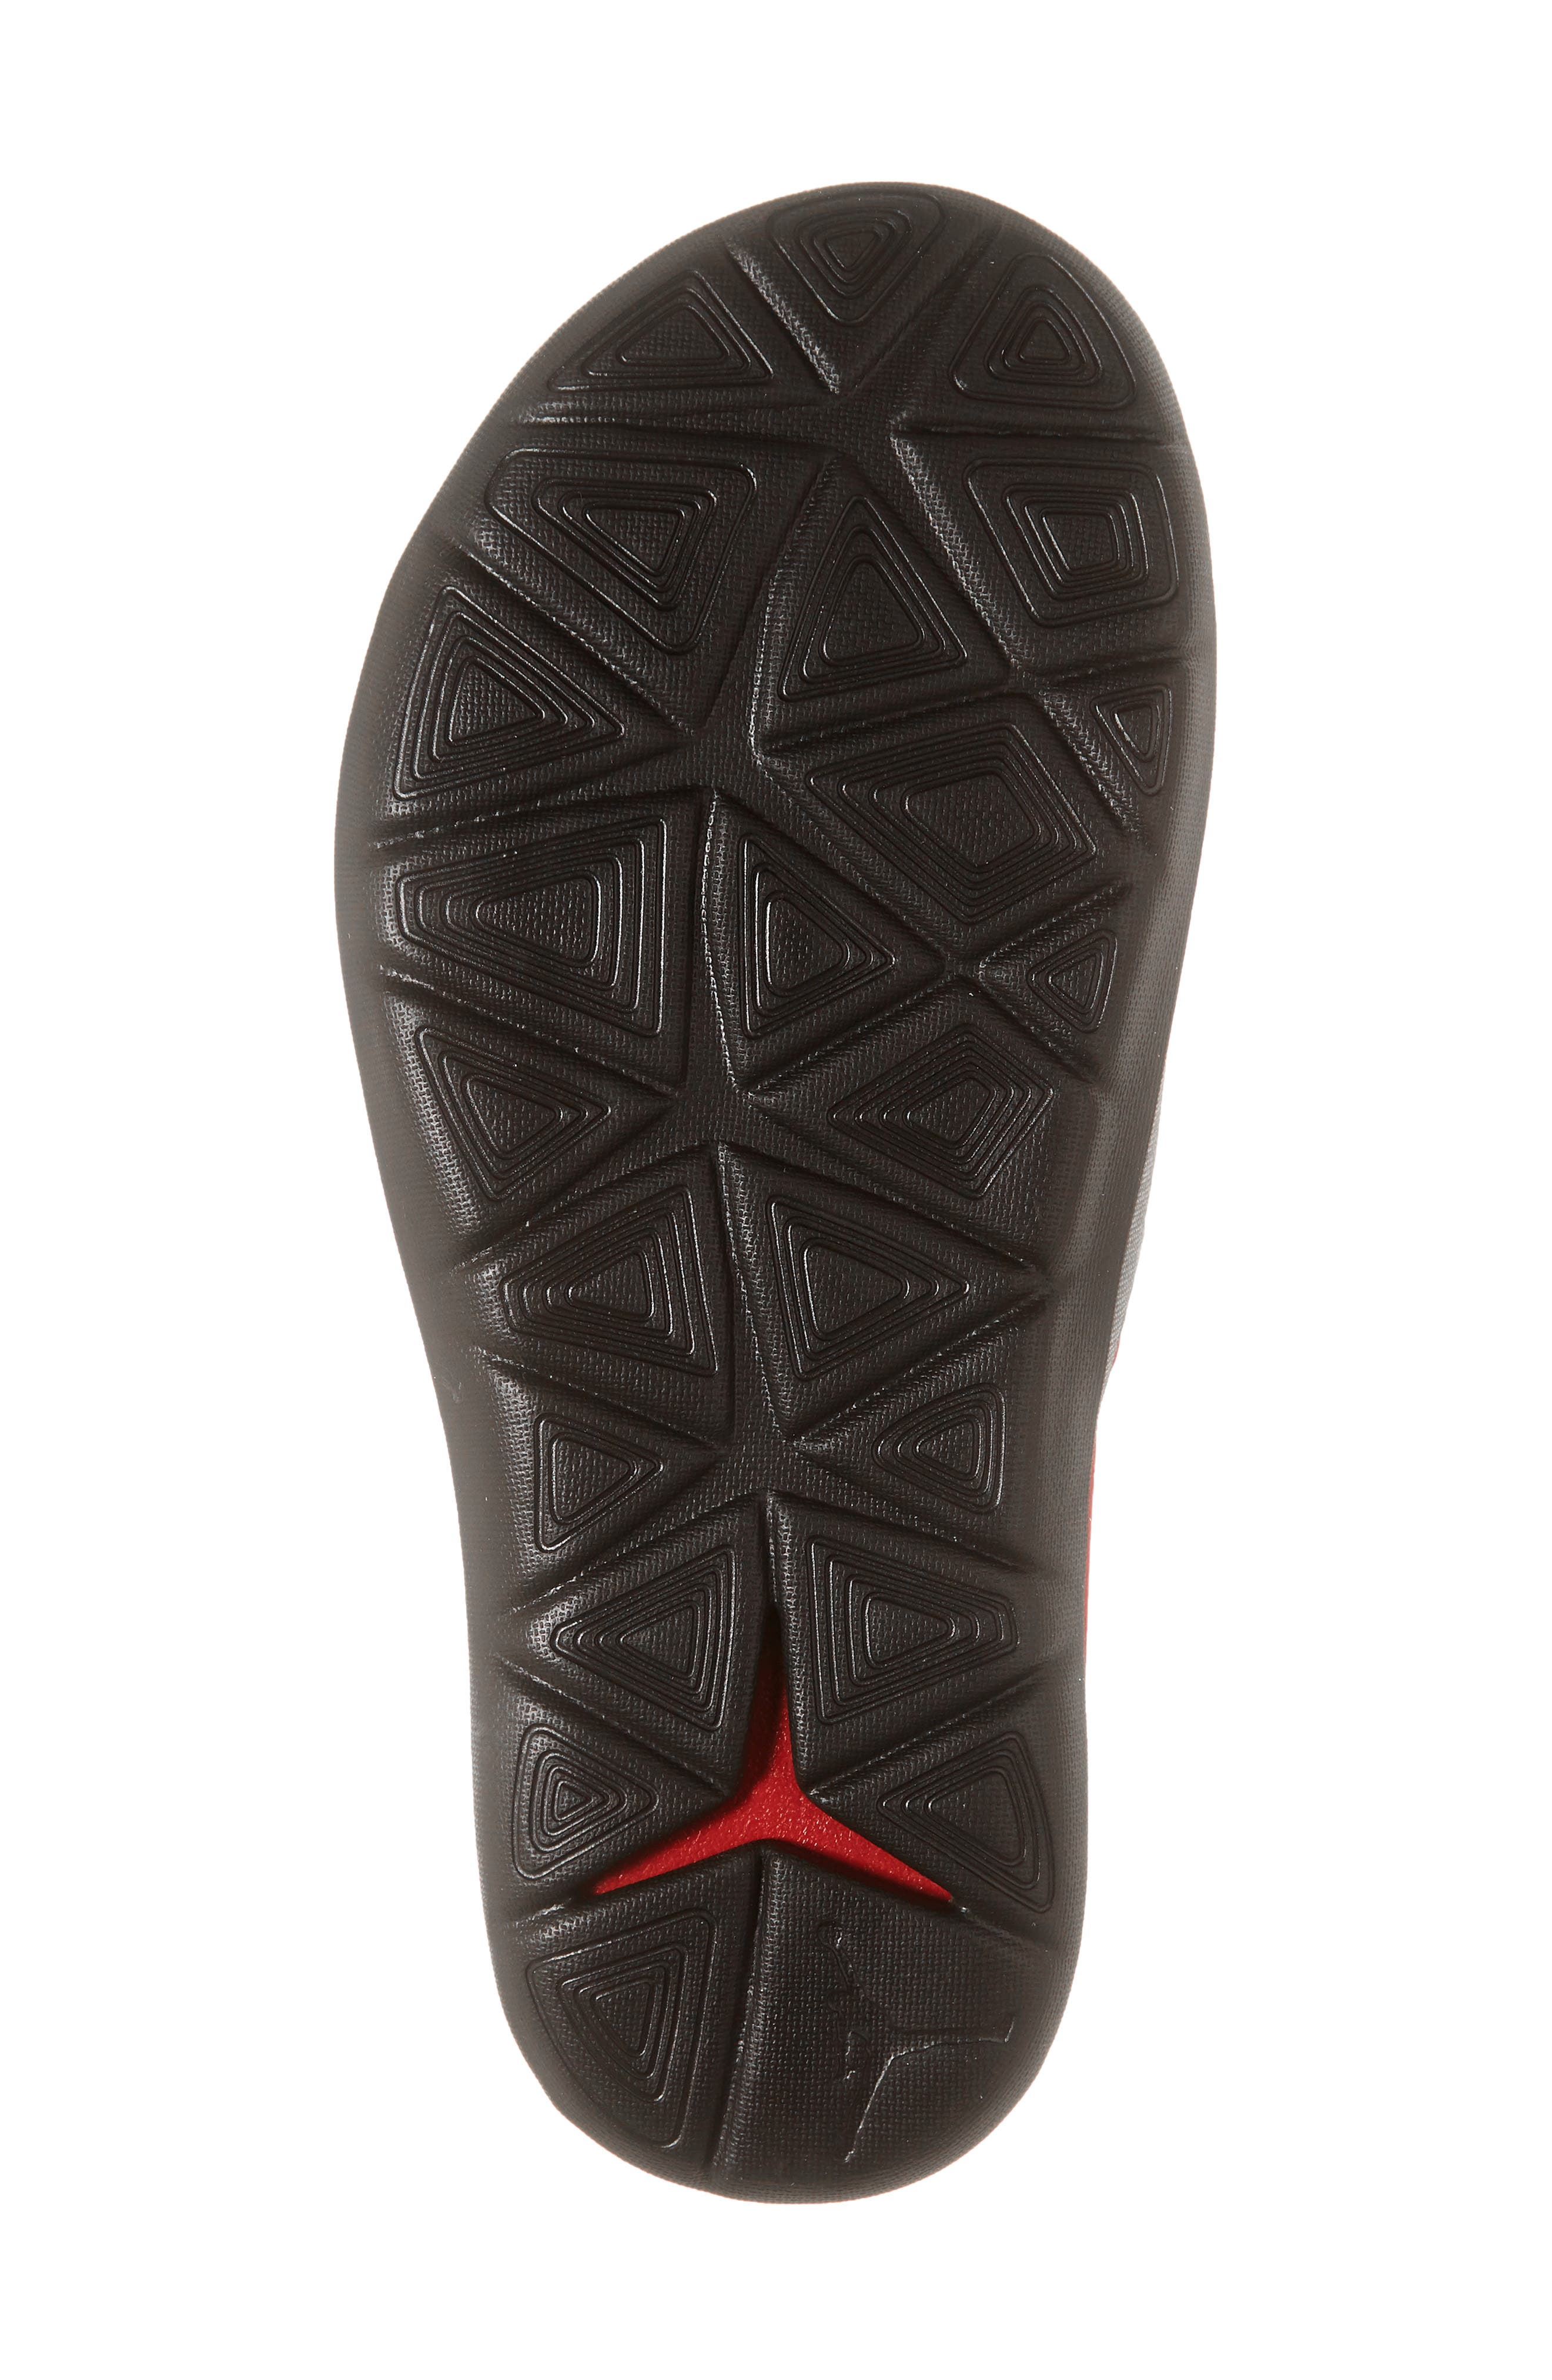 JORDAN, Hydro 7 V2 Sandal, Alternate thumbnail 6, color, GYM RED/ BLACK